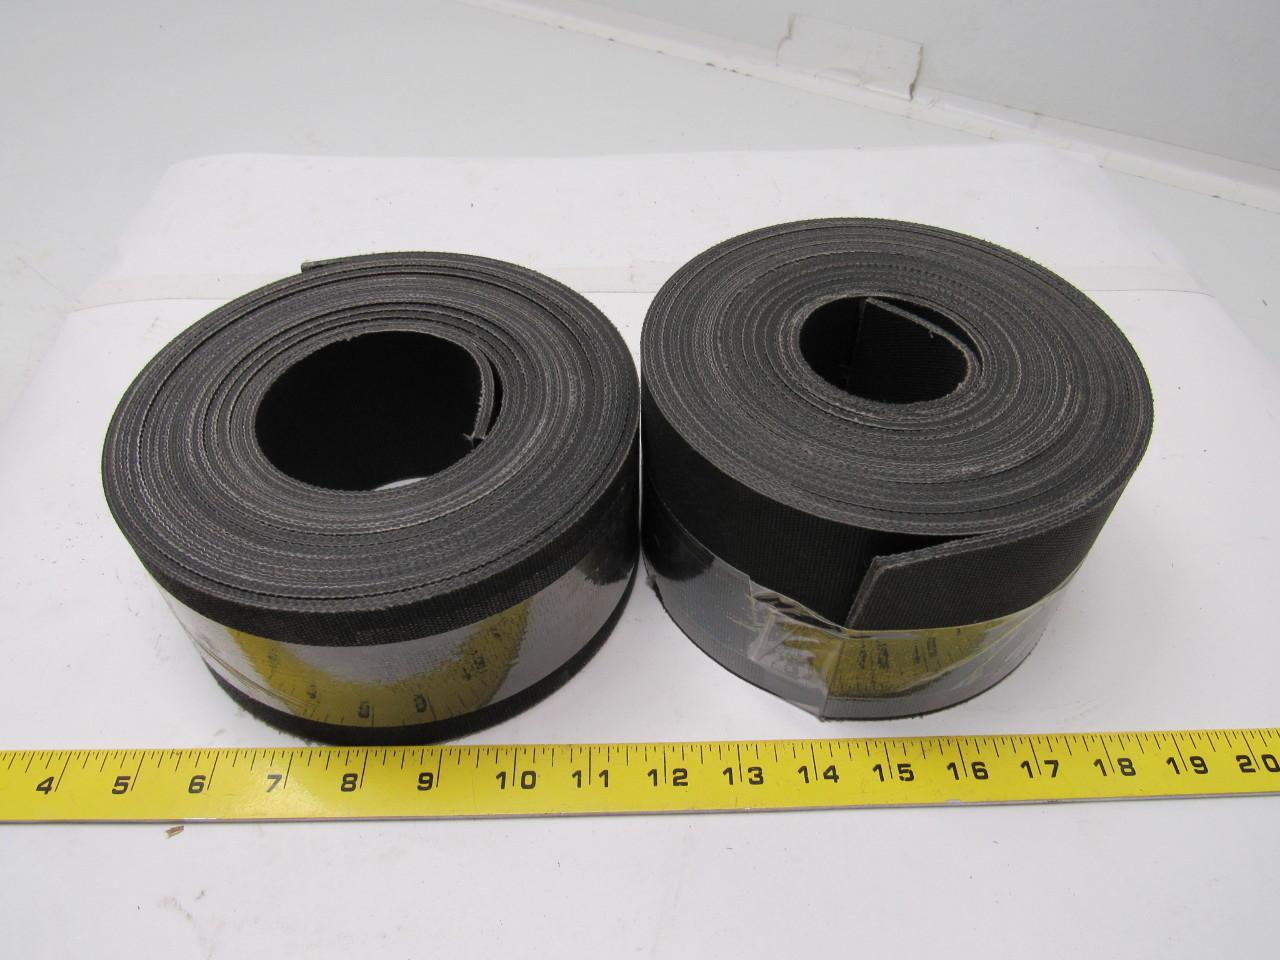 "3-Ply Black Nylon/Fabric Top Conveyor Belt 0.140"" thick 2 rolls  3.375 x 17' and 3.250 x 17'"